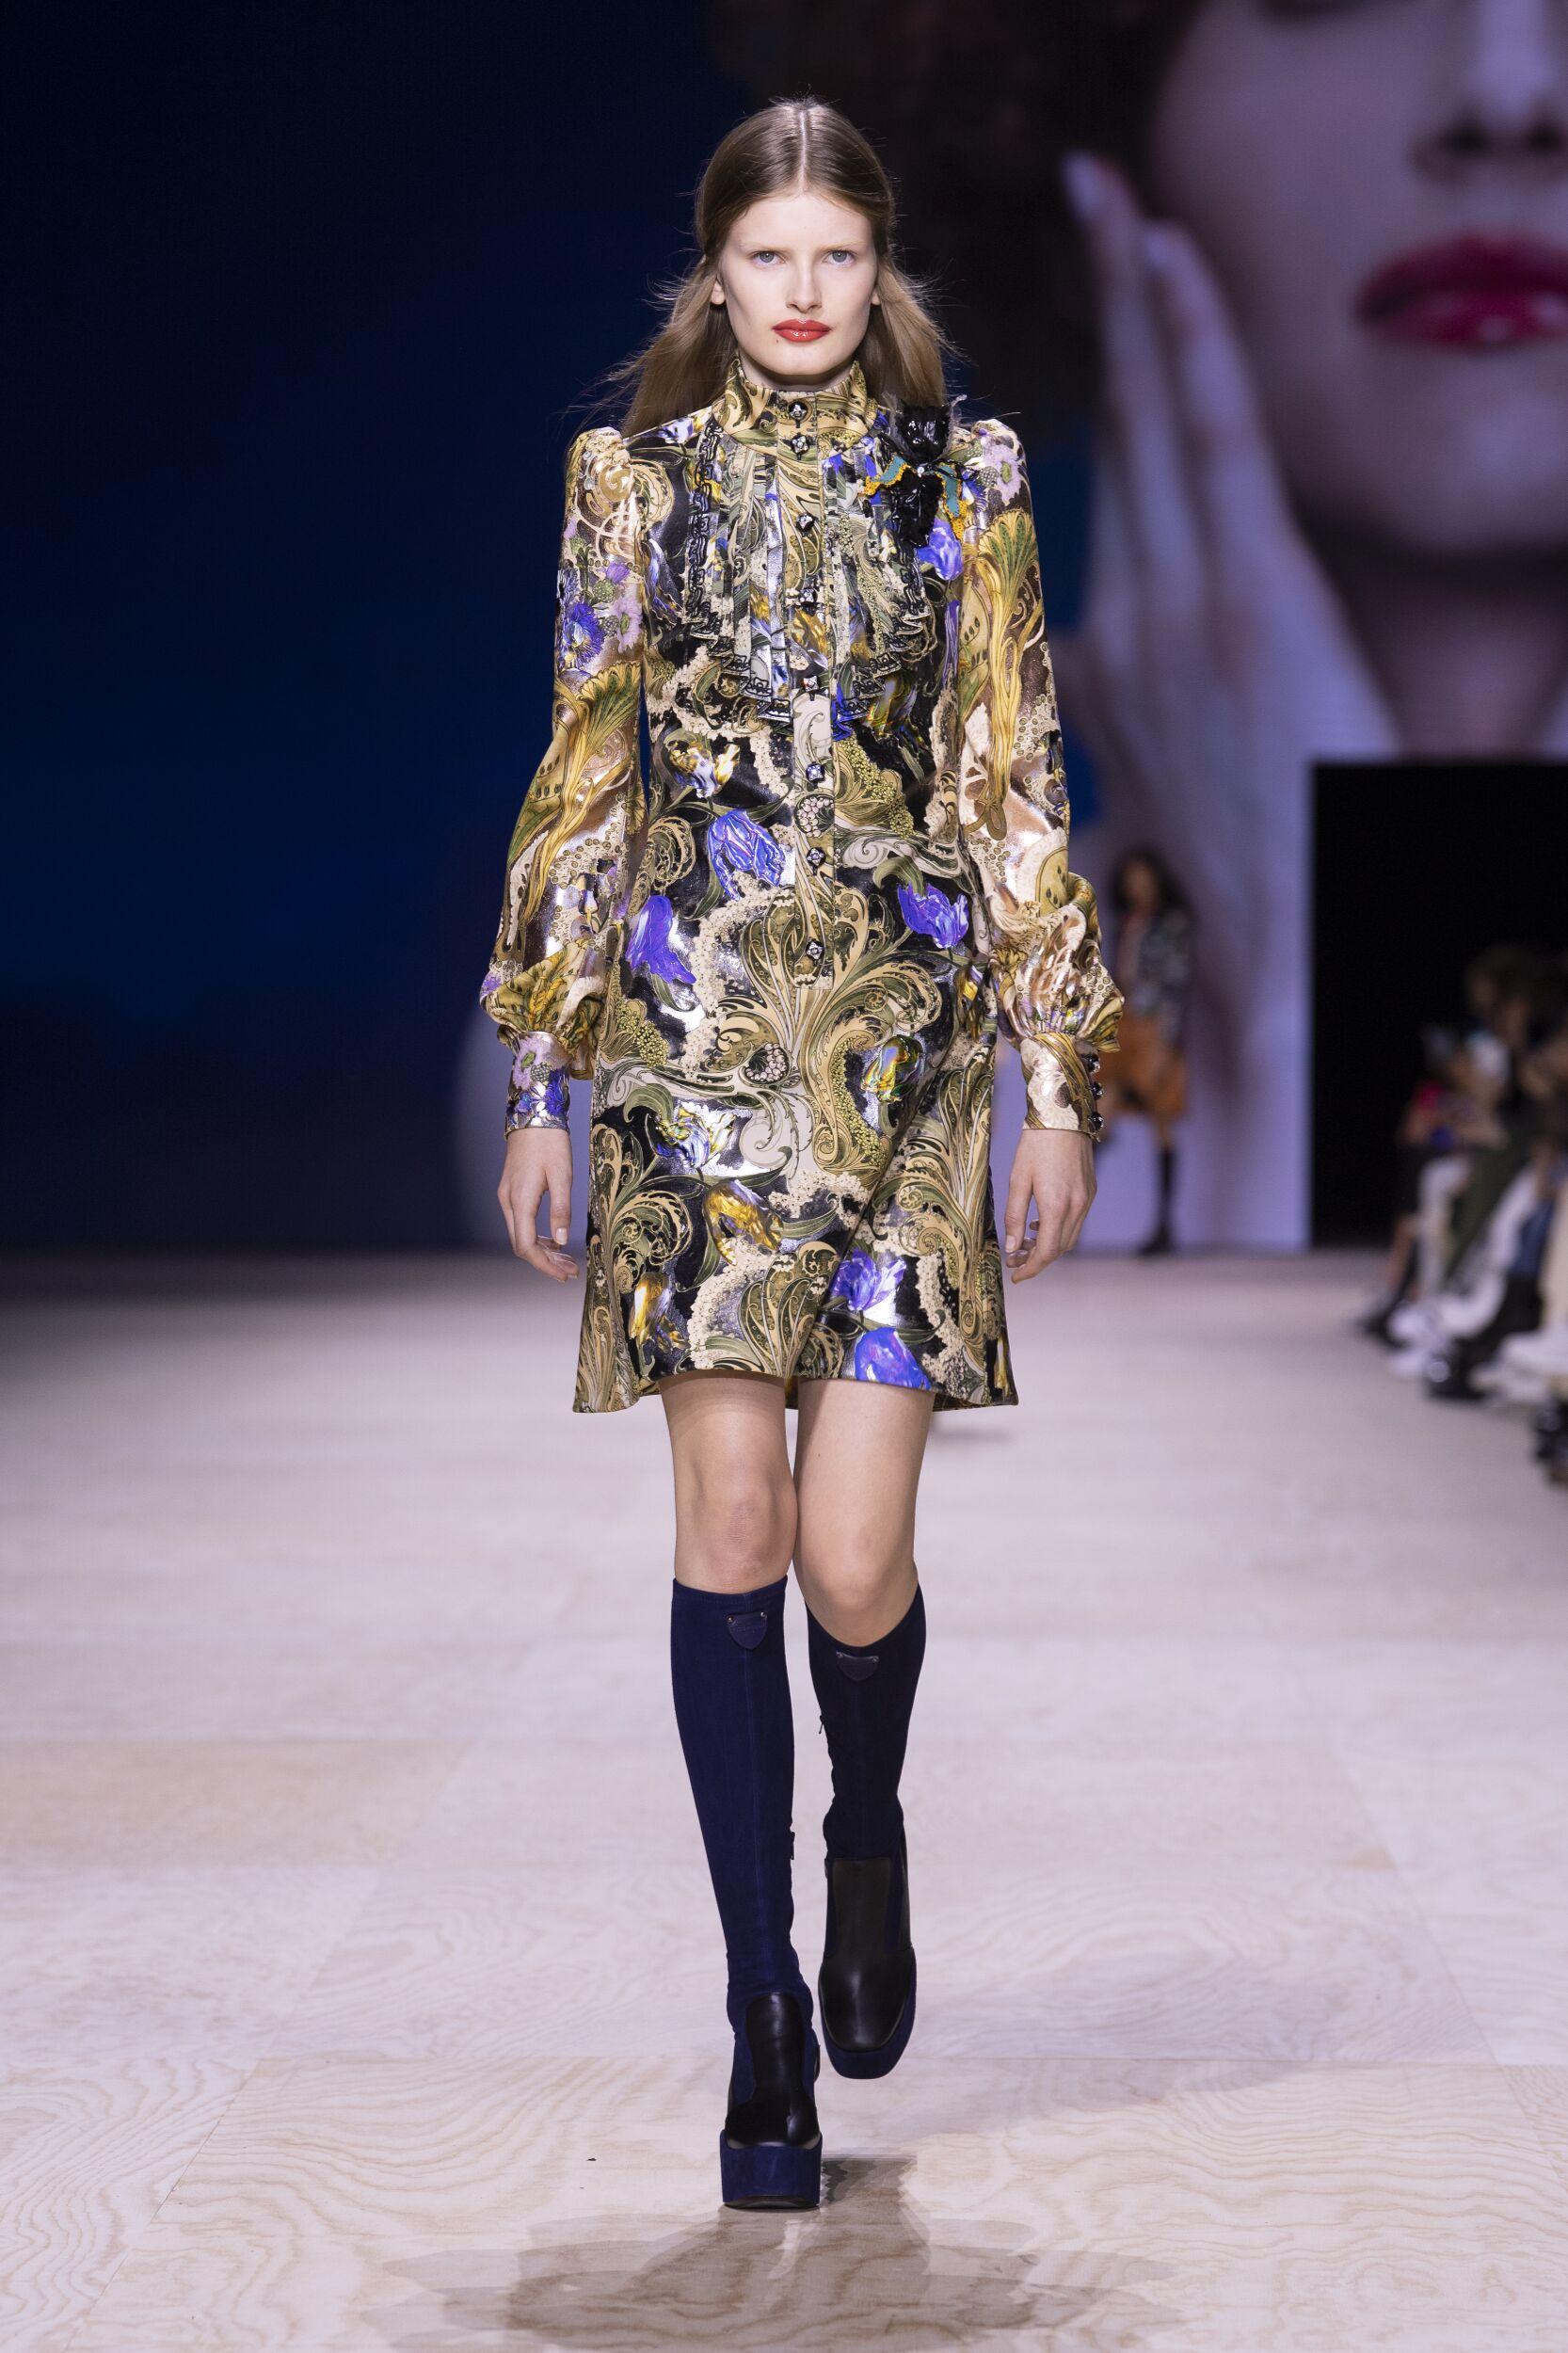 2020 Louis Vuitton Catwalk